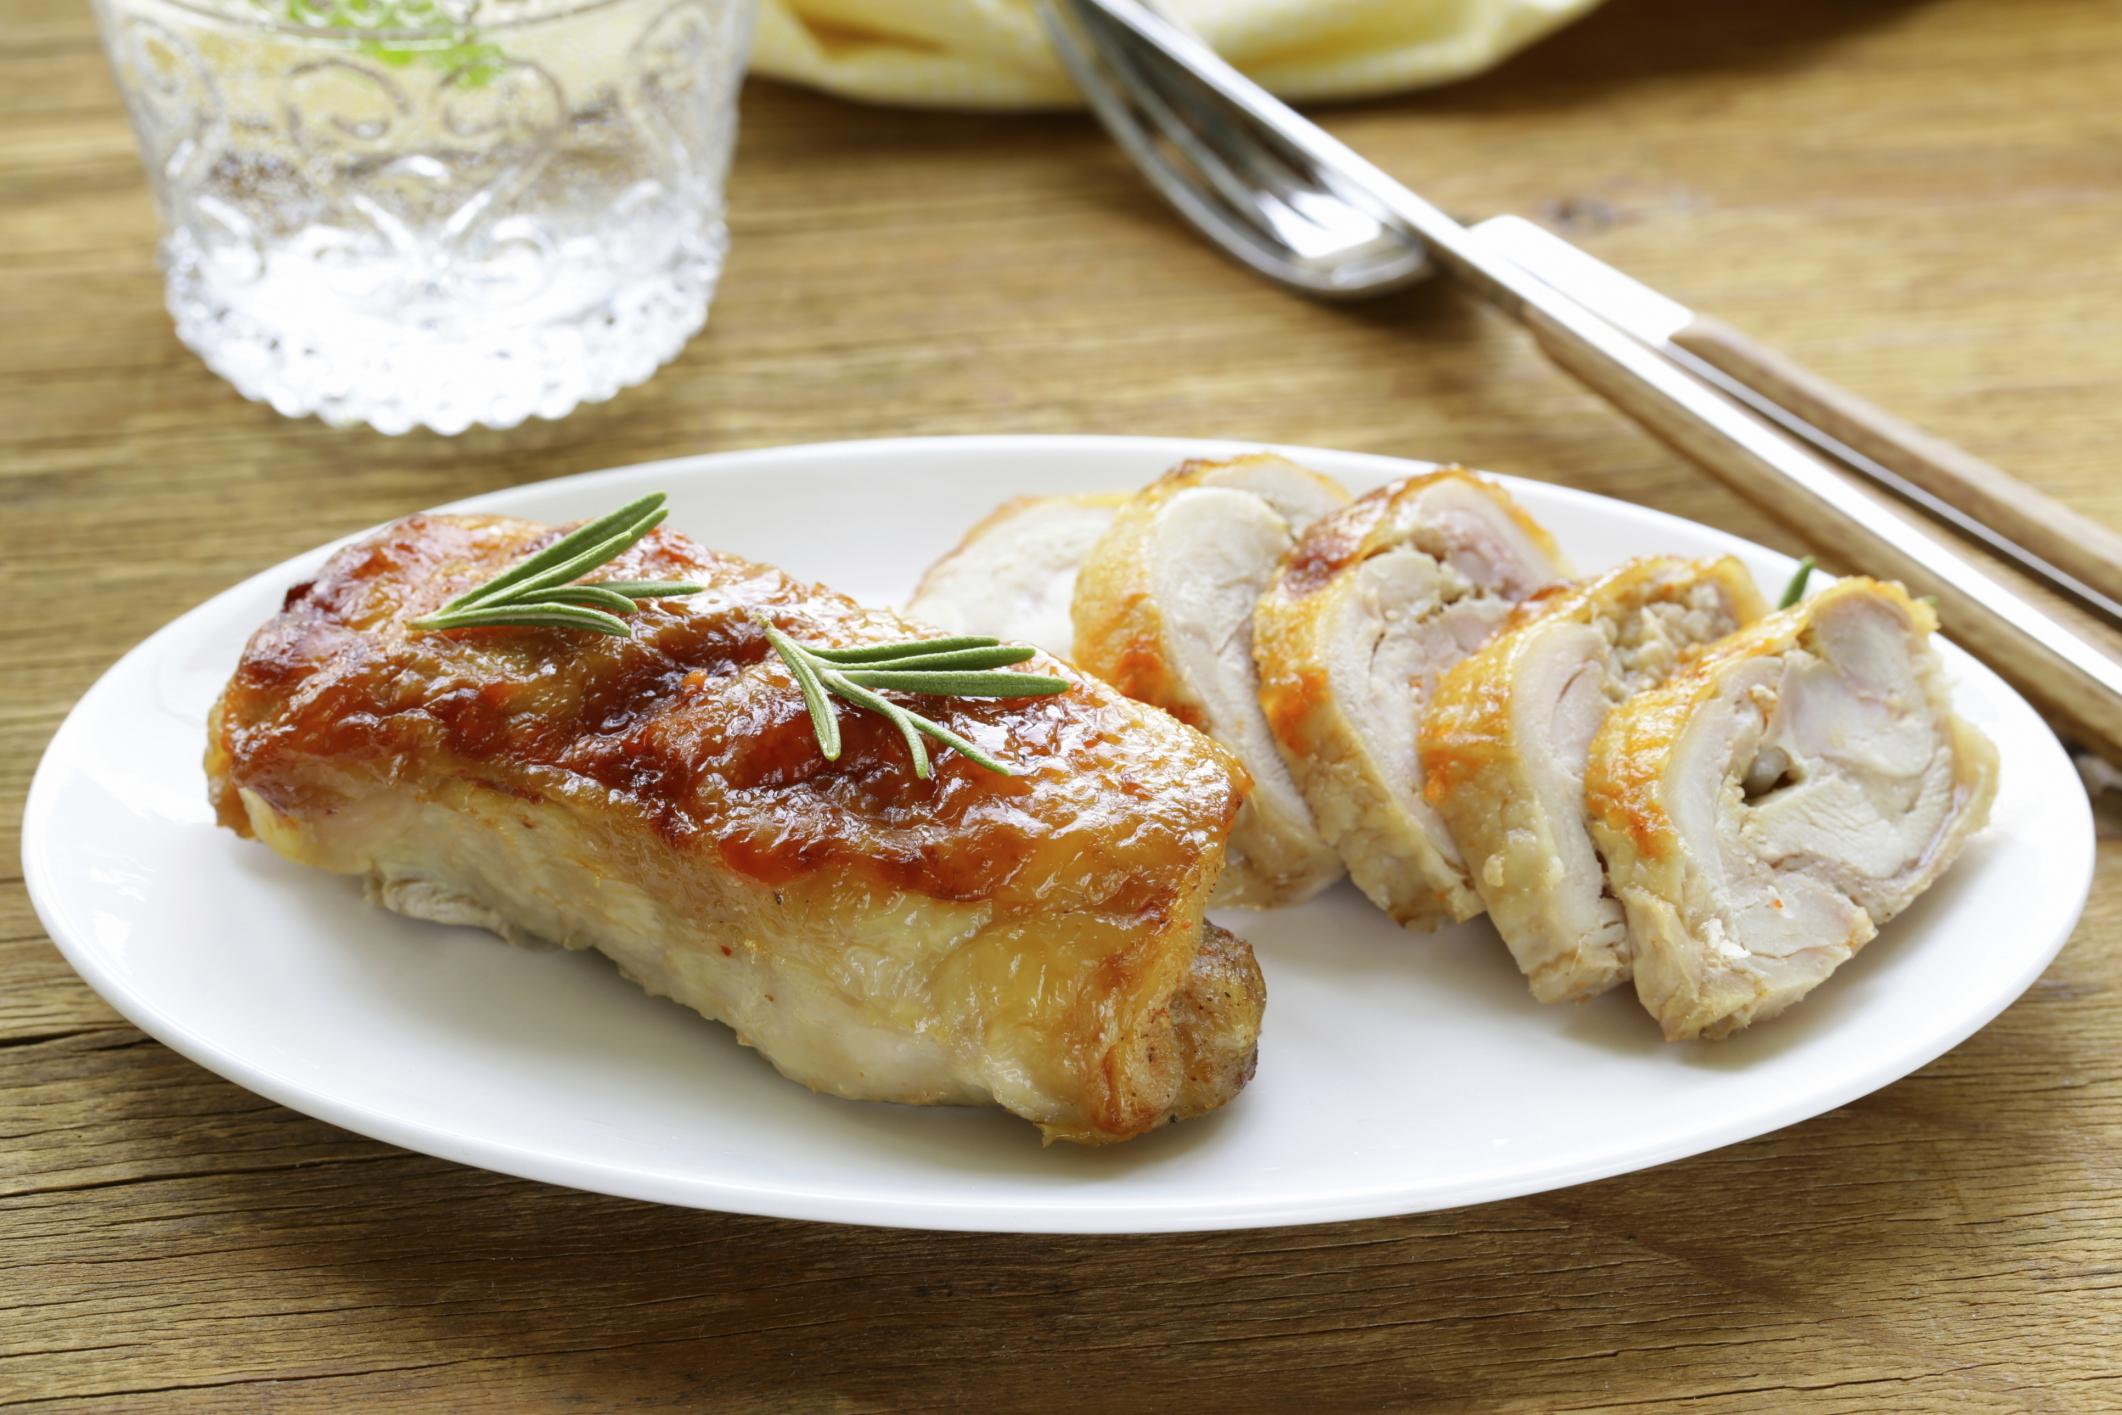 Pechuga de pollo con jamón y queso